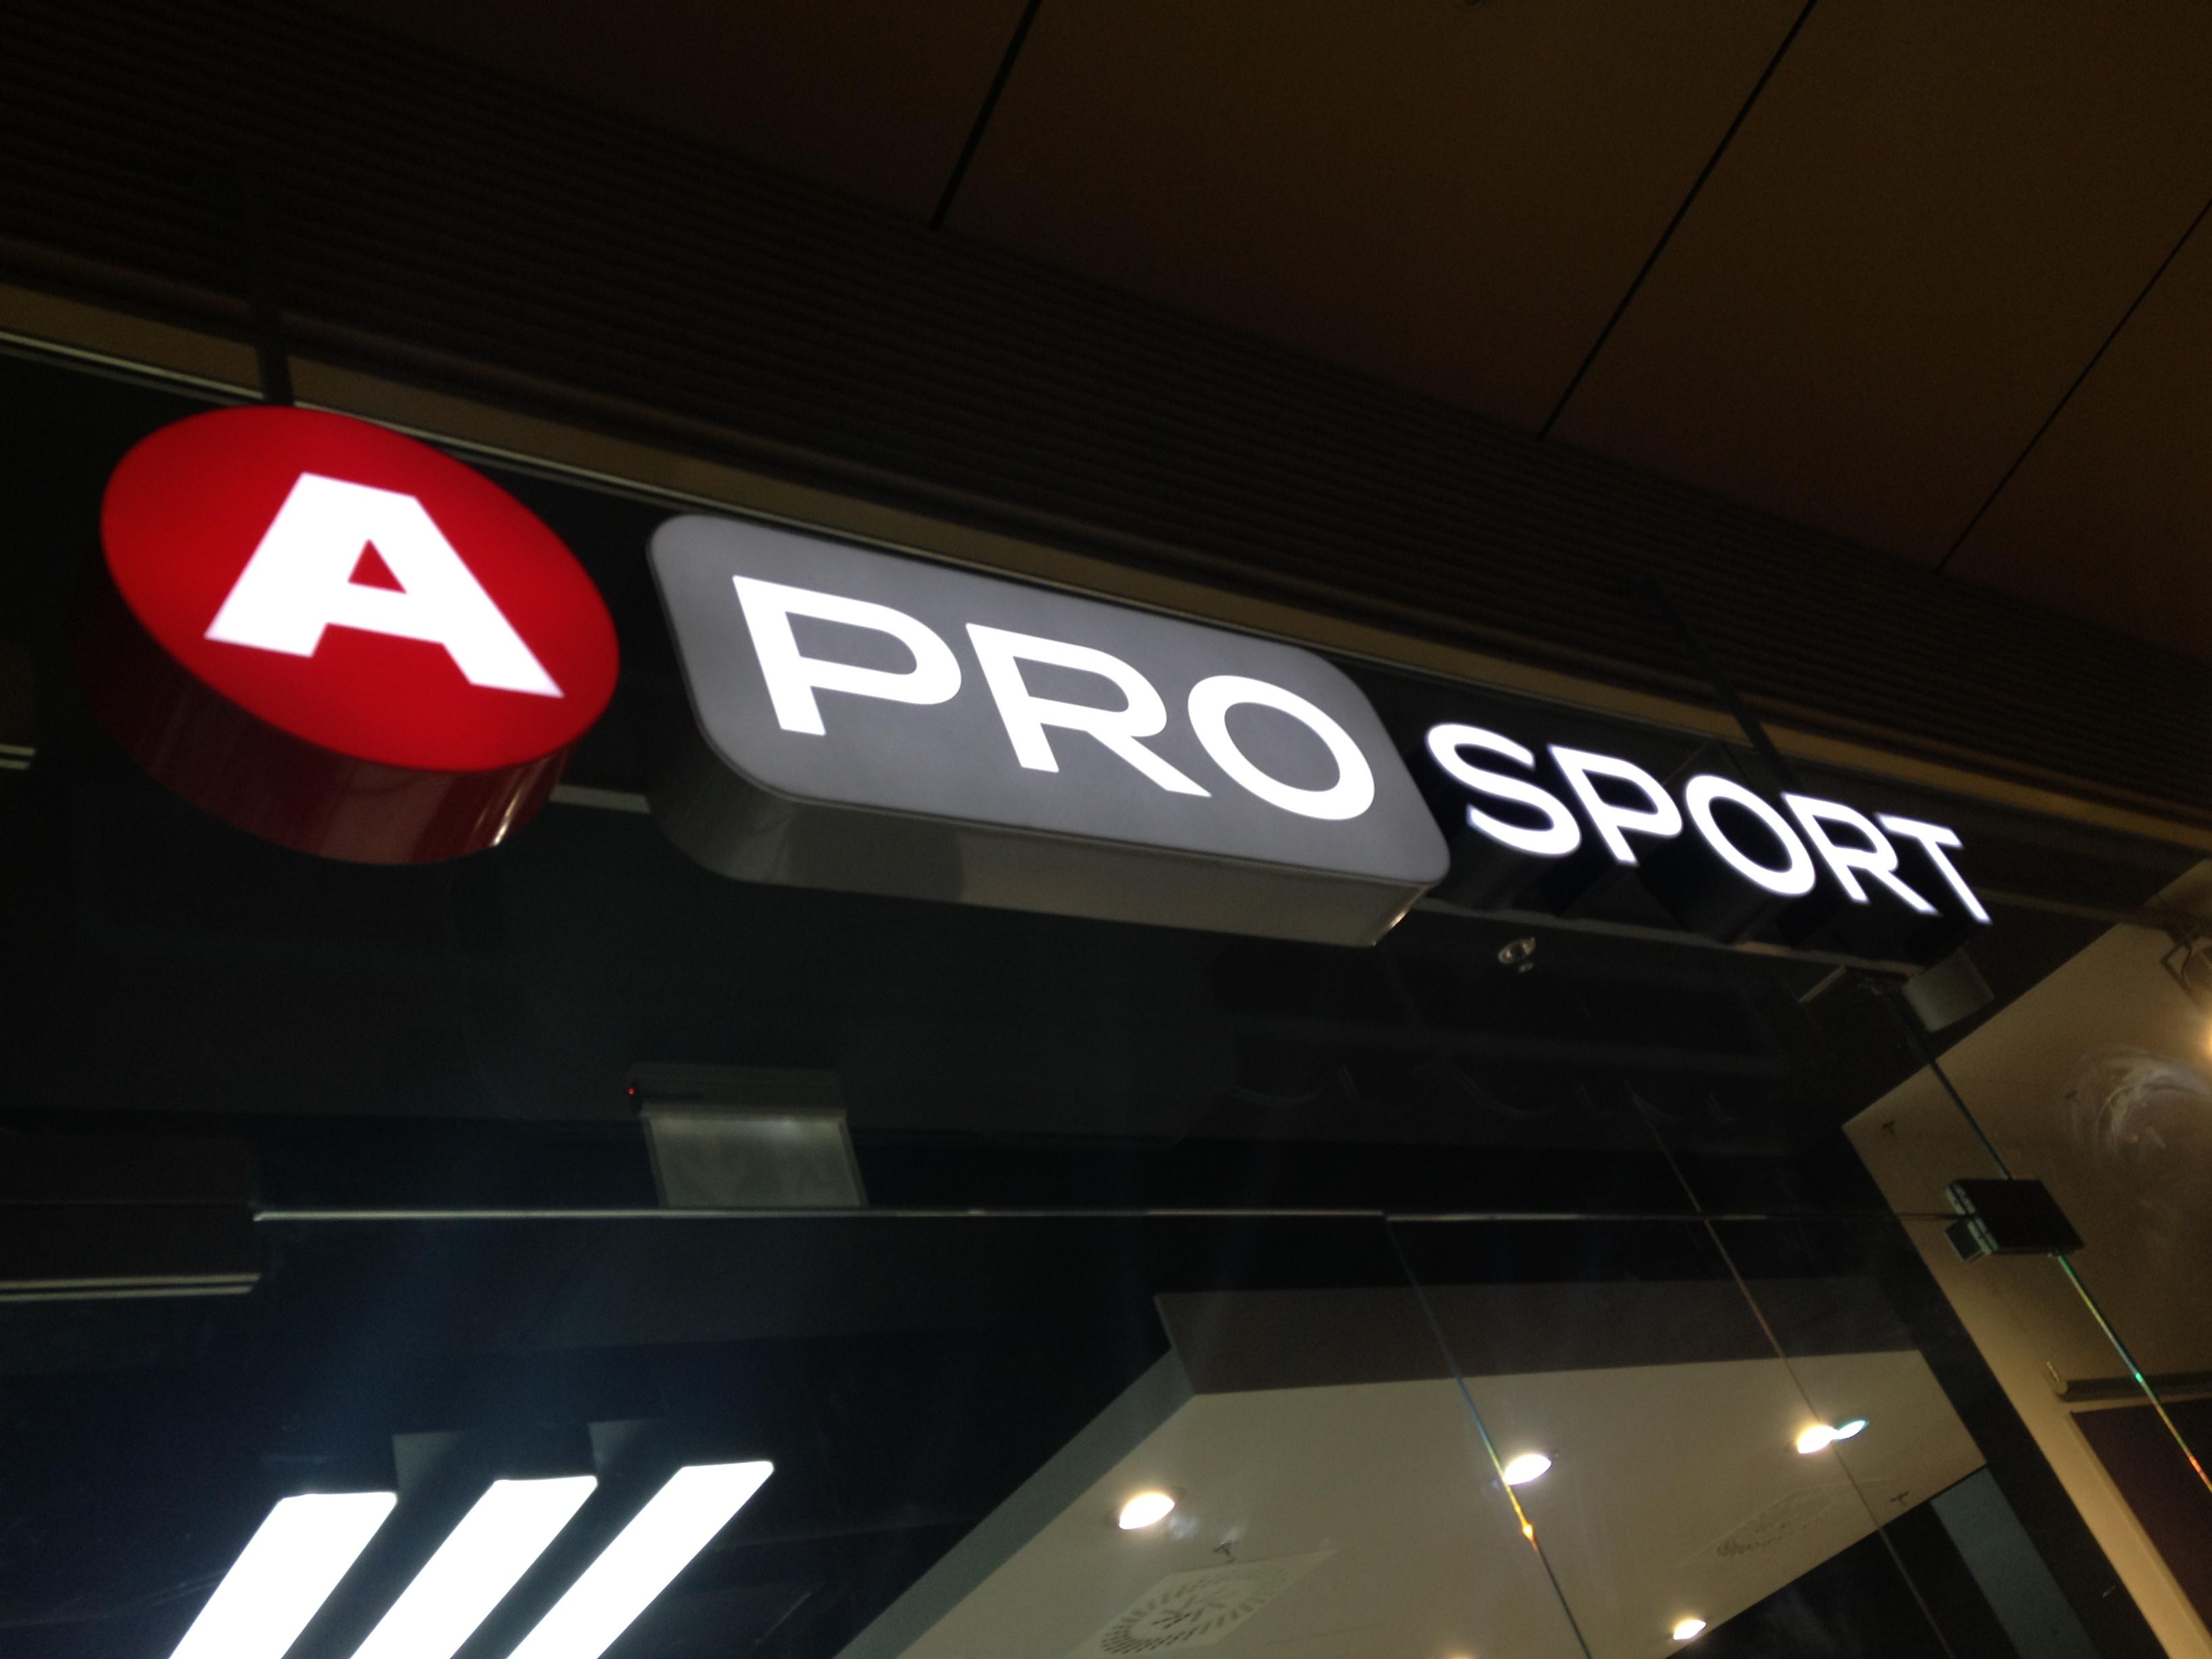 A pro sport